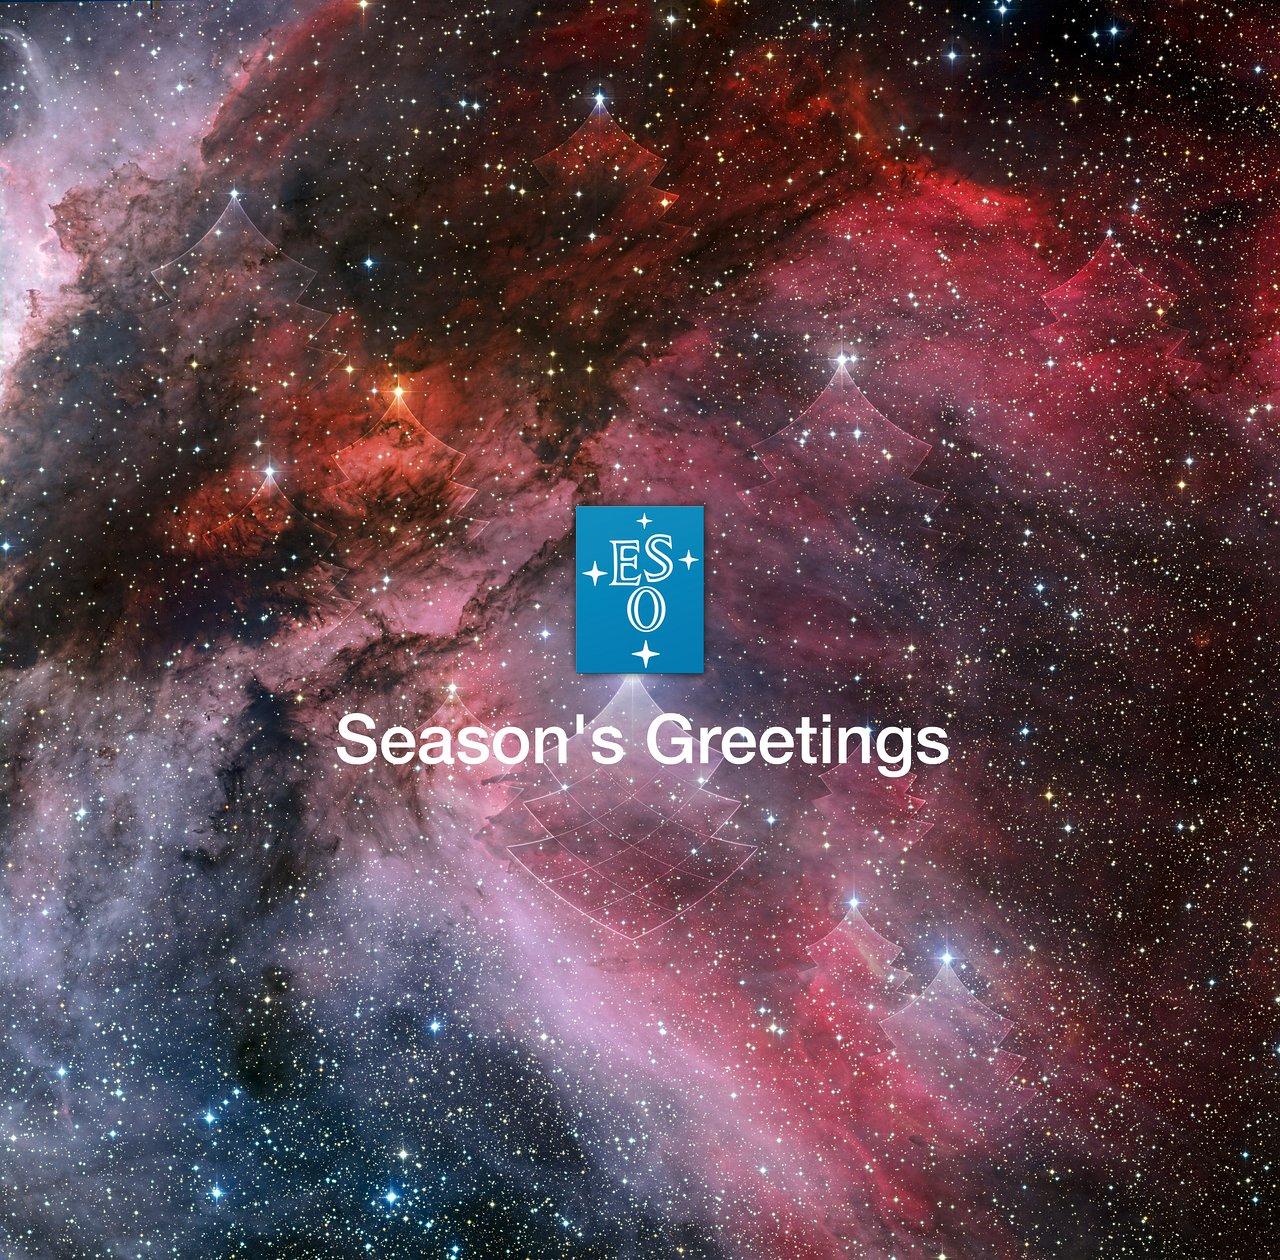 Our Season's Greetings e-card